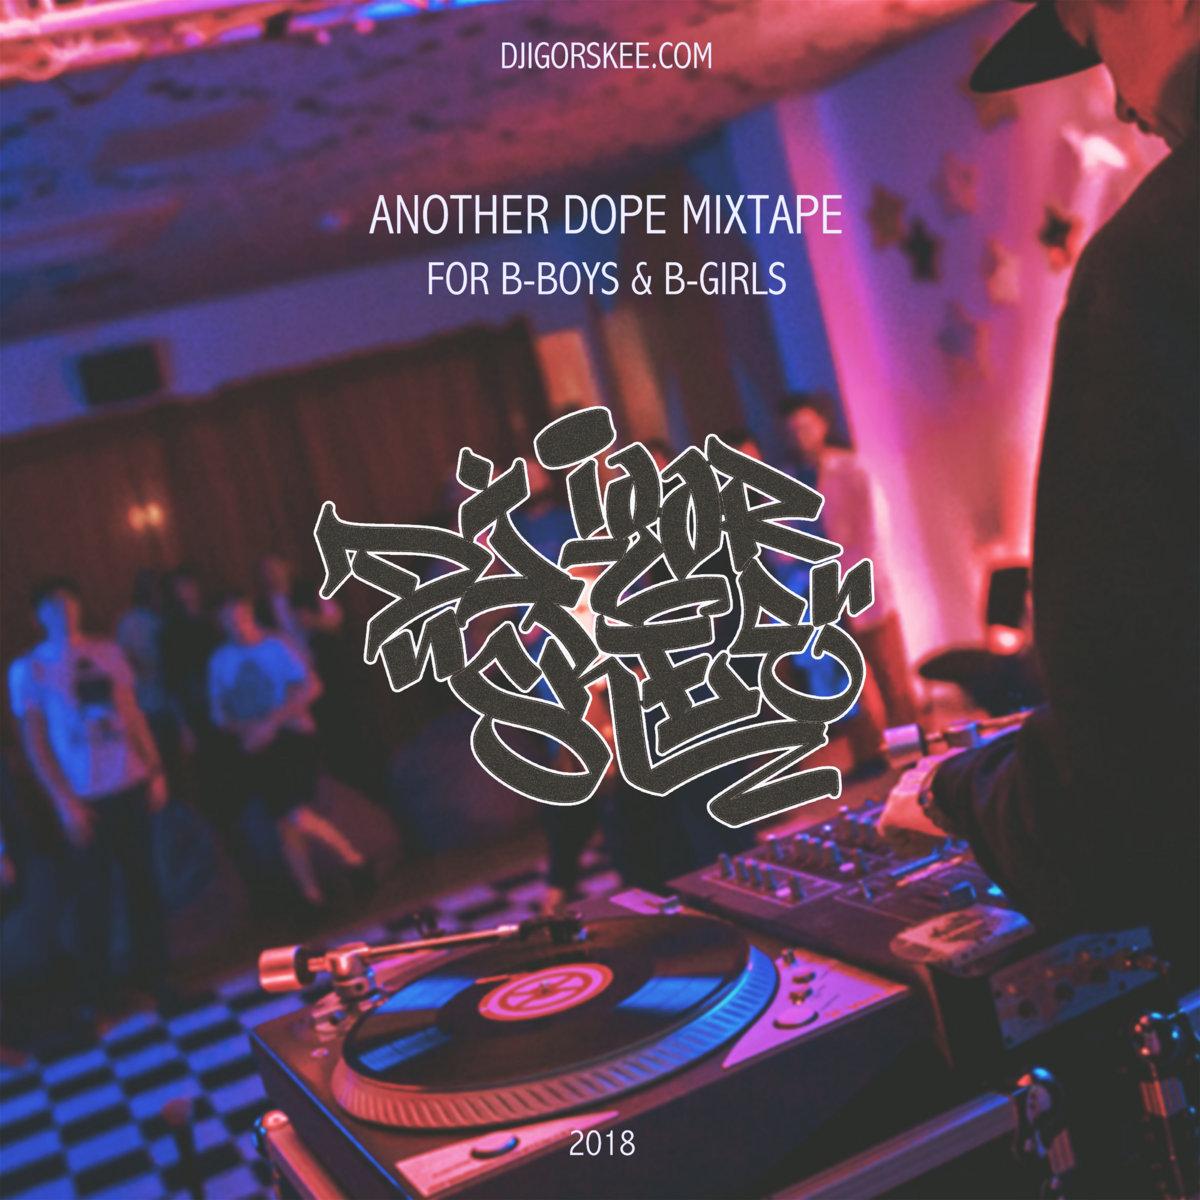 Another Dope B-boy Mix 2018 | DJ IGORSKEE